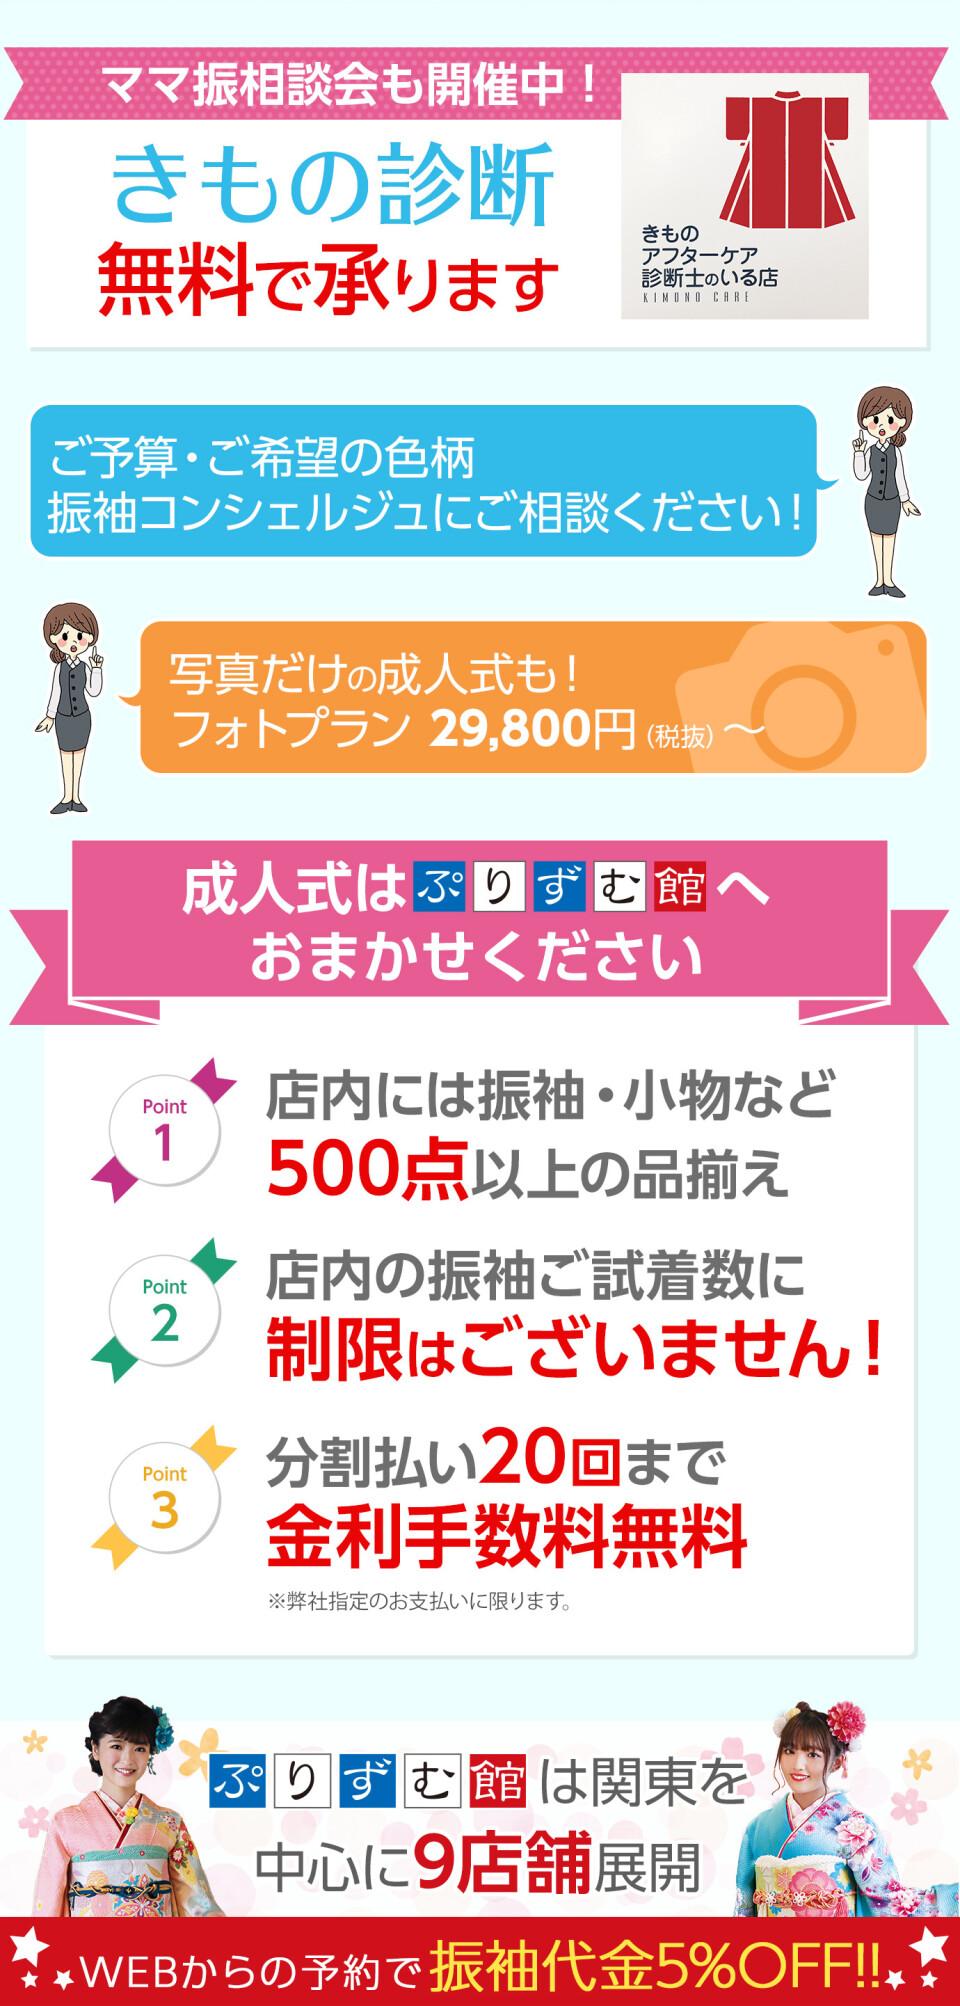 event_main_img3_10